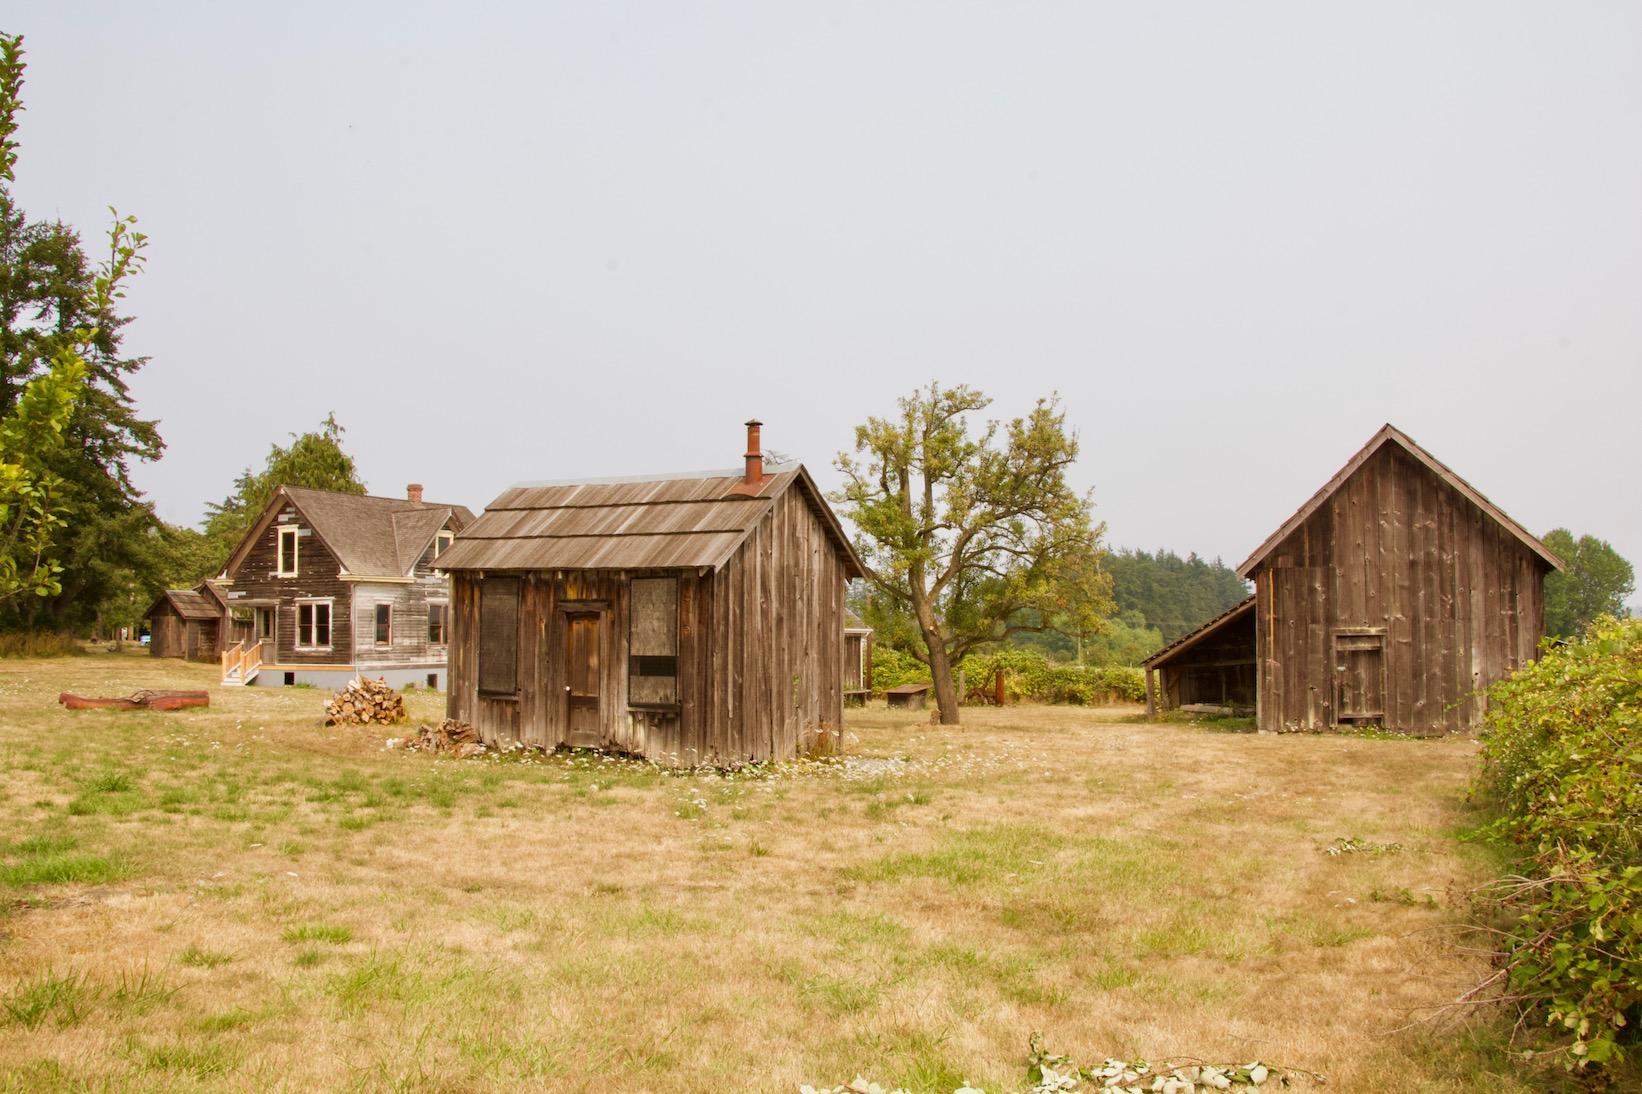 Newman Farm Park, Victoria, BC